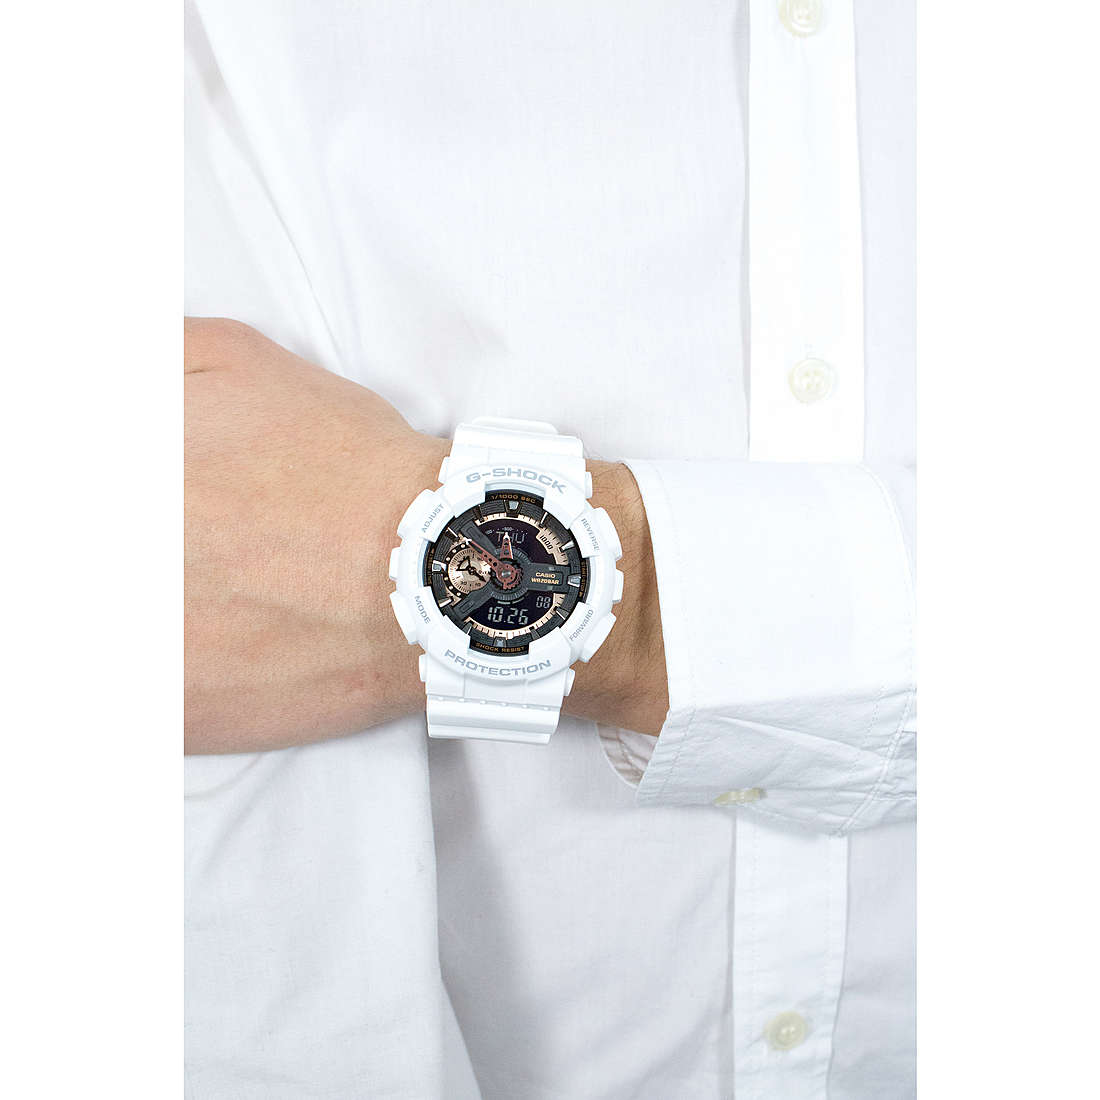 Casio digitali G-Shock uomo GA-110RG-7AER indosso